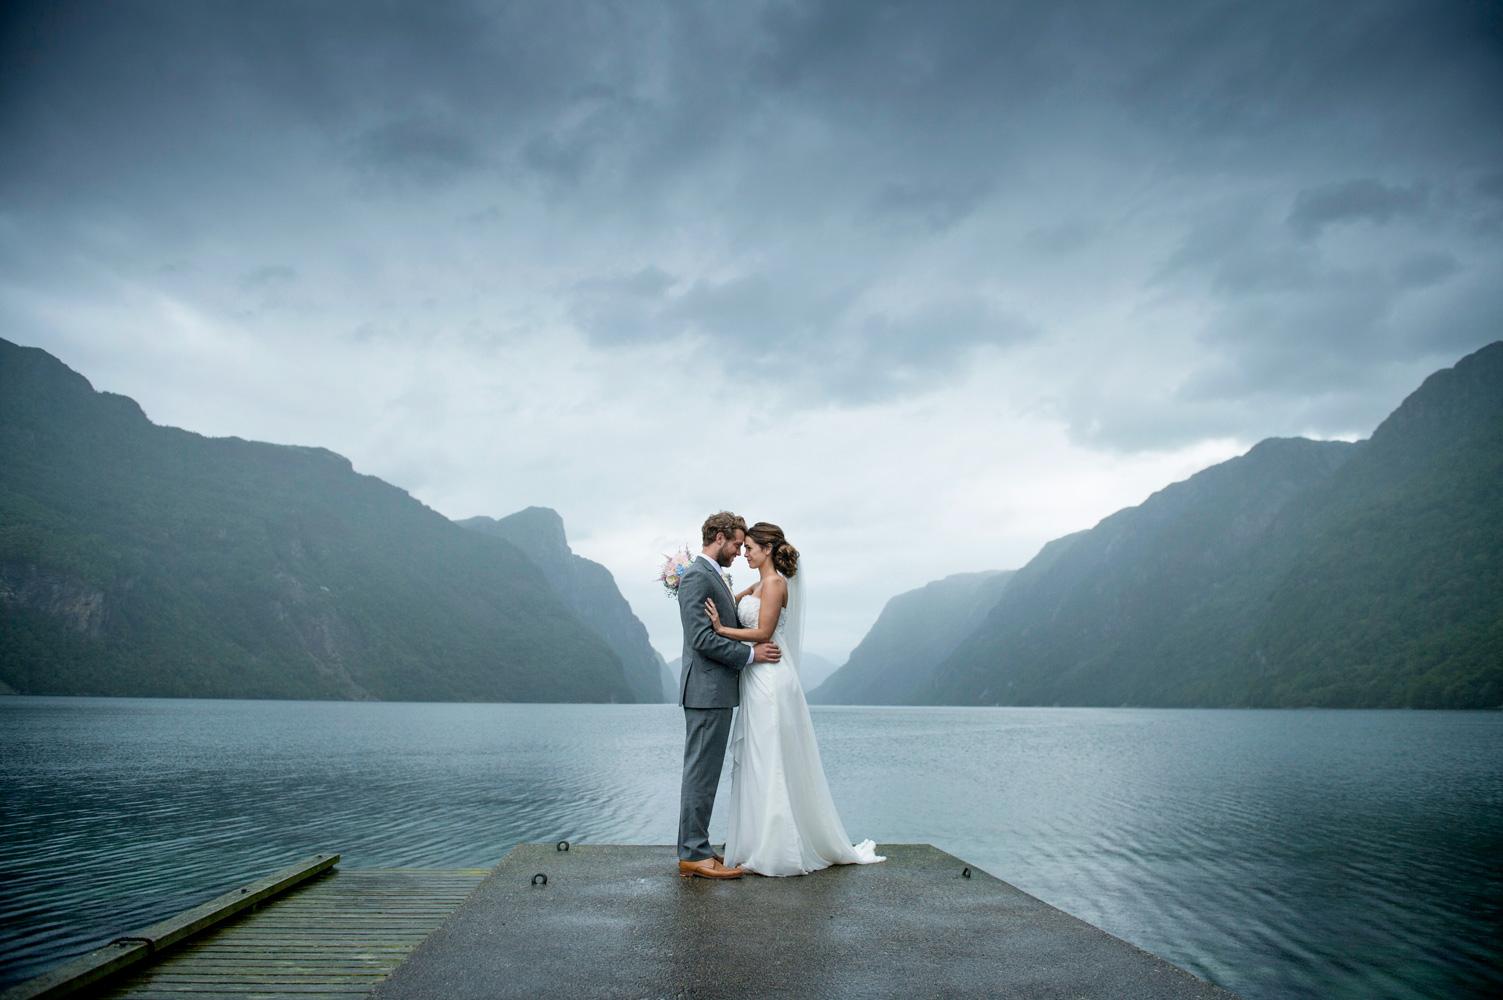 Simon Buck Wedding Venue Photographers Norfolk - Homepage Slider Image 2